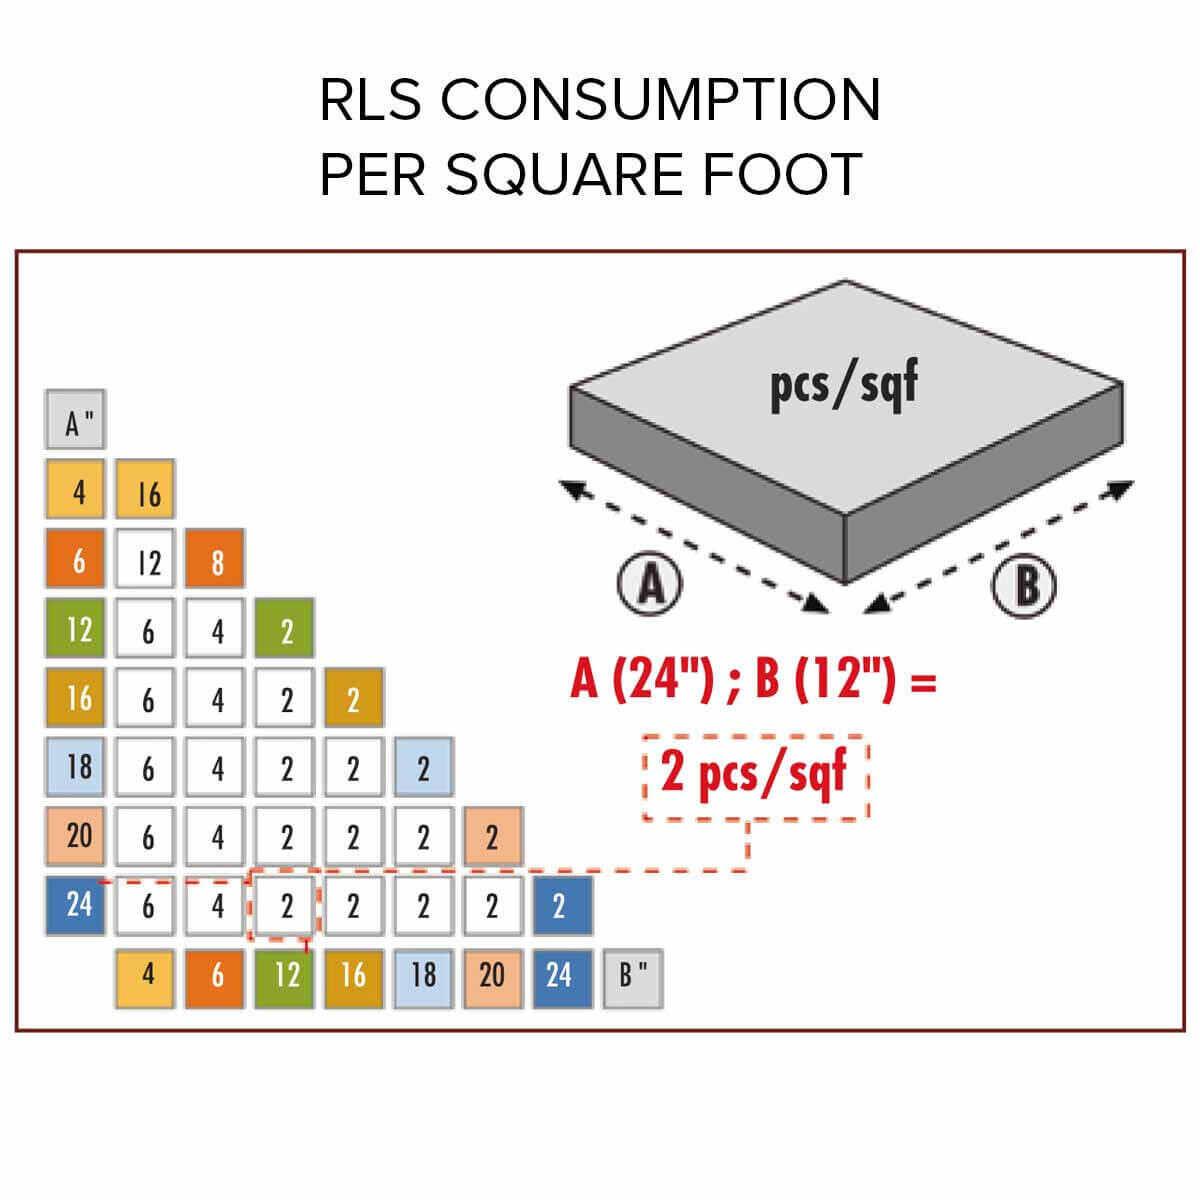 raimondi RLS chart lippage free installation per square foot